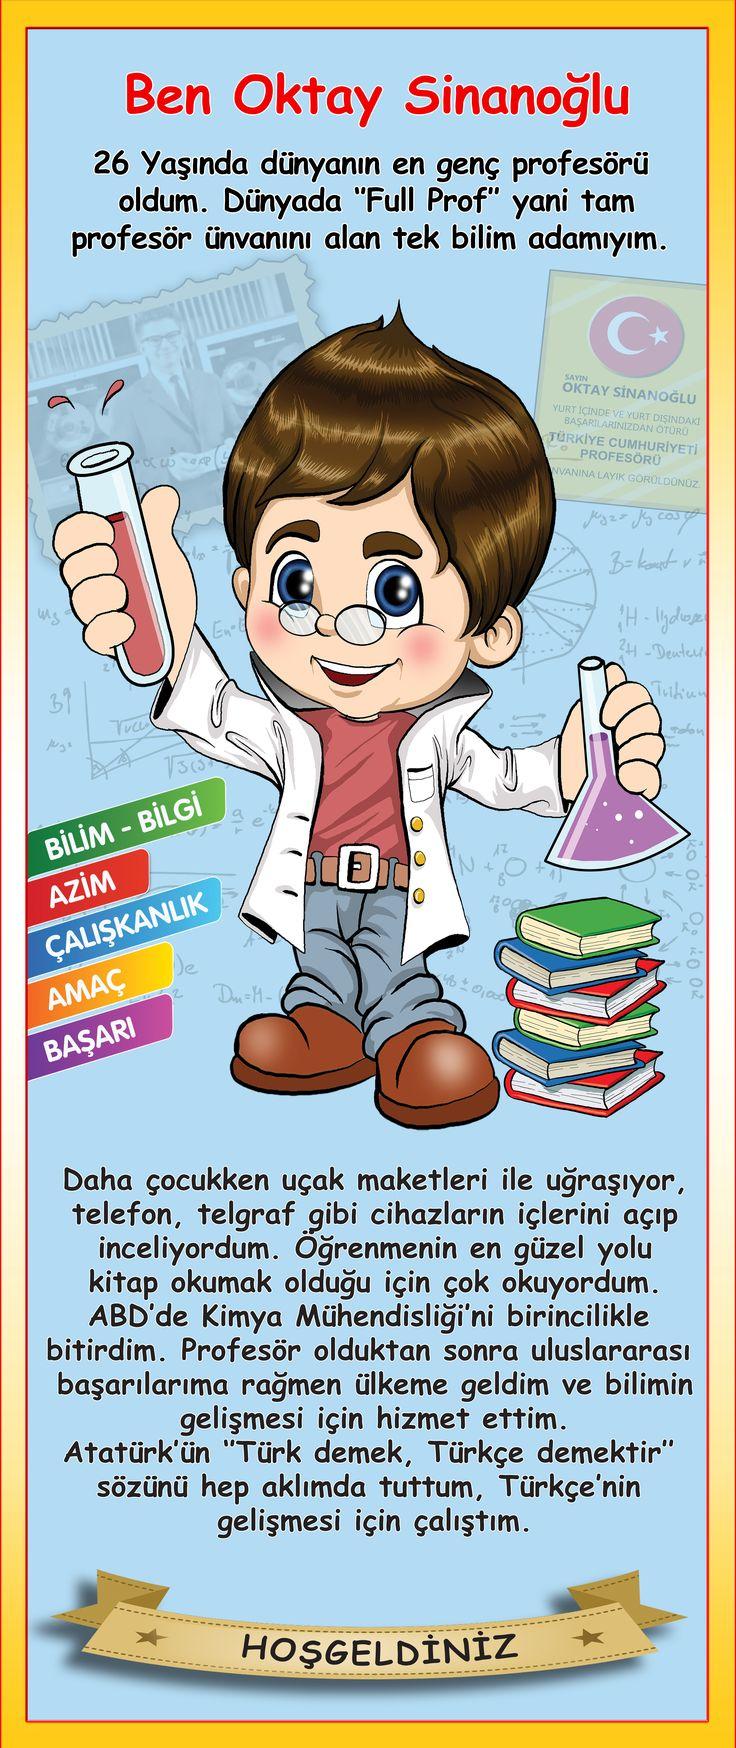 24 Eğitim http://turkrazzi.com/ppost/436004807664361373/